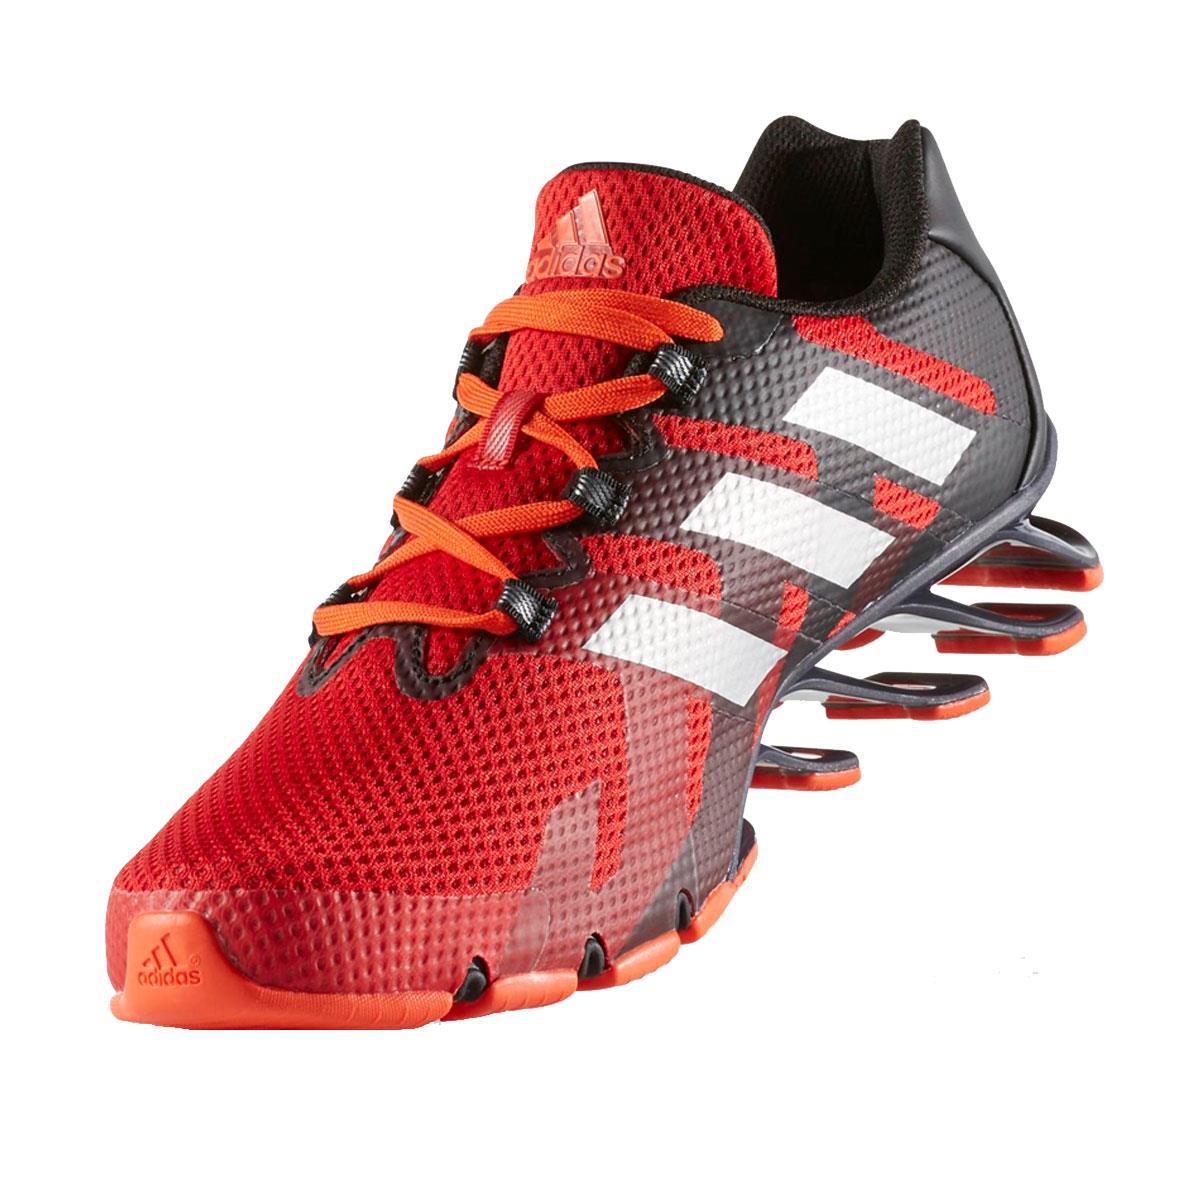 Tênis Adidas Springblade E-force Masculino abb11f85b222d